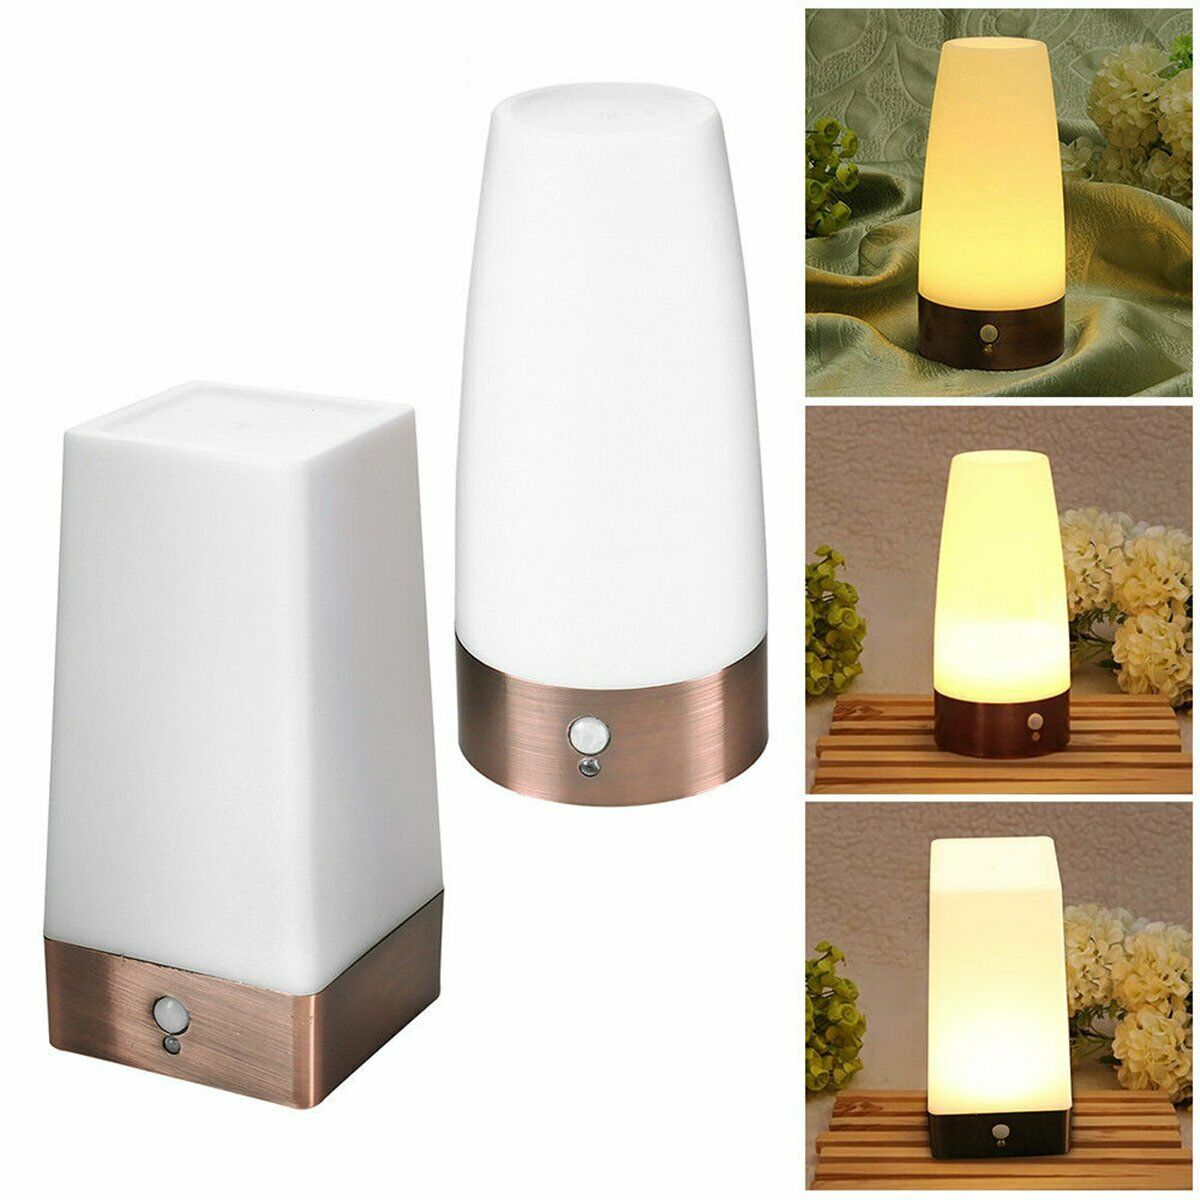 Smart Wireless PIR Motion Sensor LED Night Light Battery Powered Table Lamp Warm White Color Night LED Lighting Home Decor